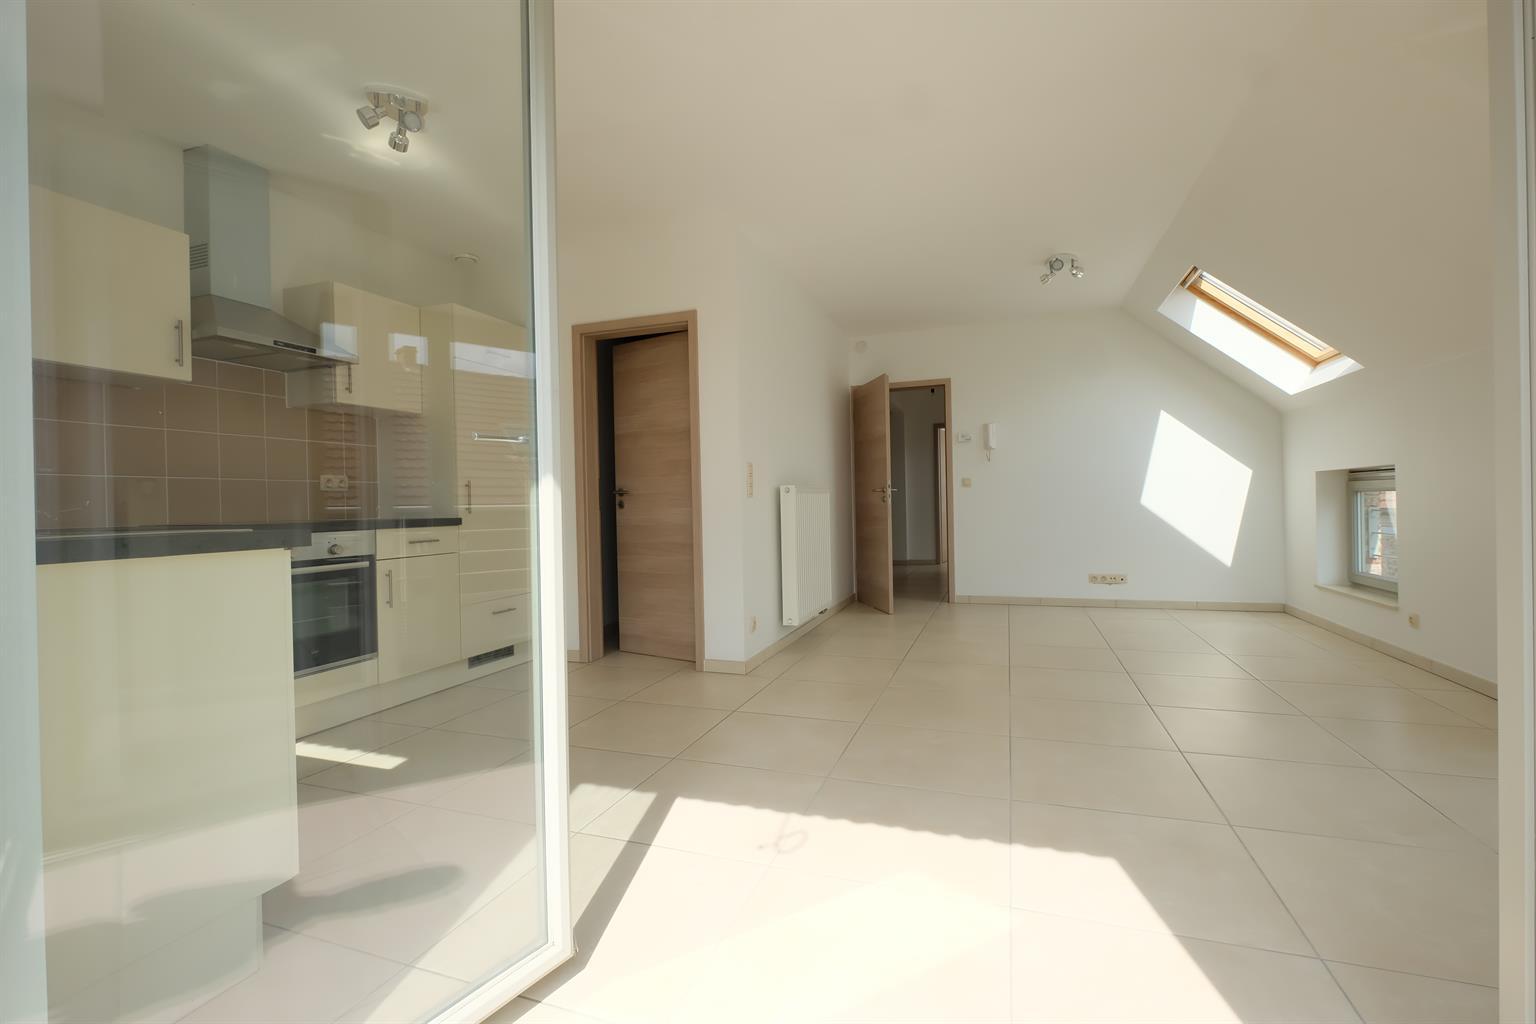 Appartement - Soignies - #4223150-8